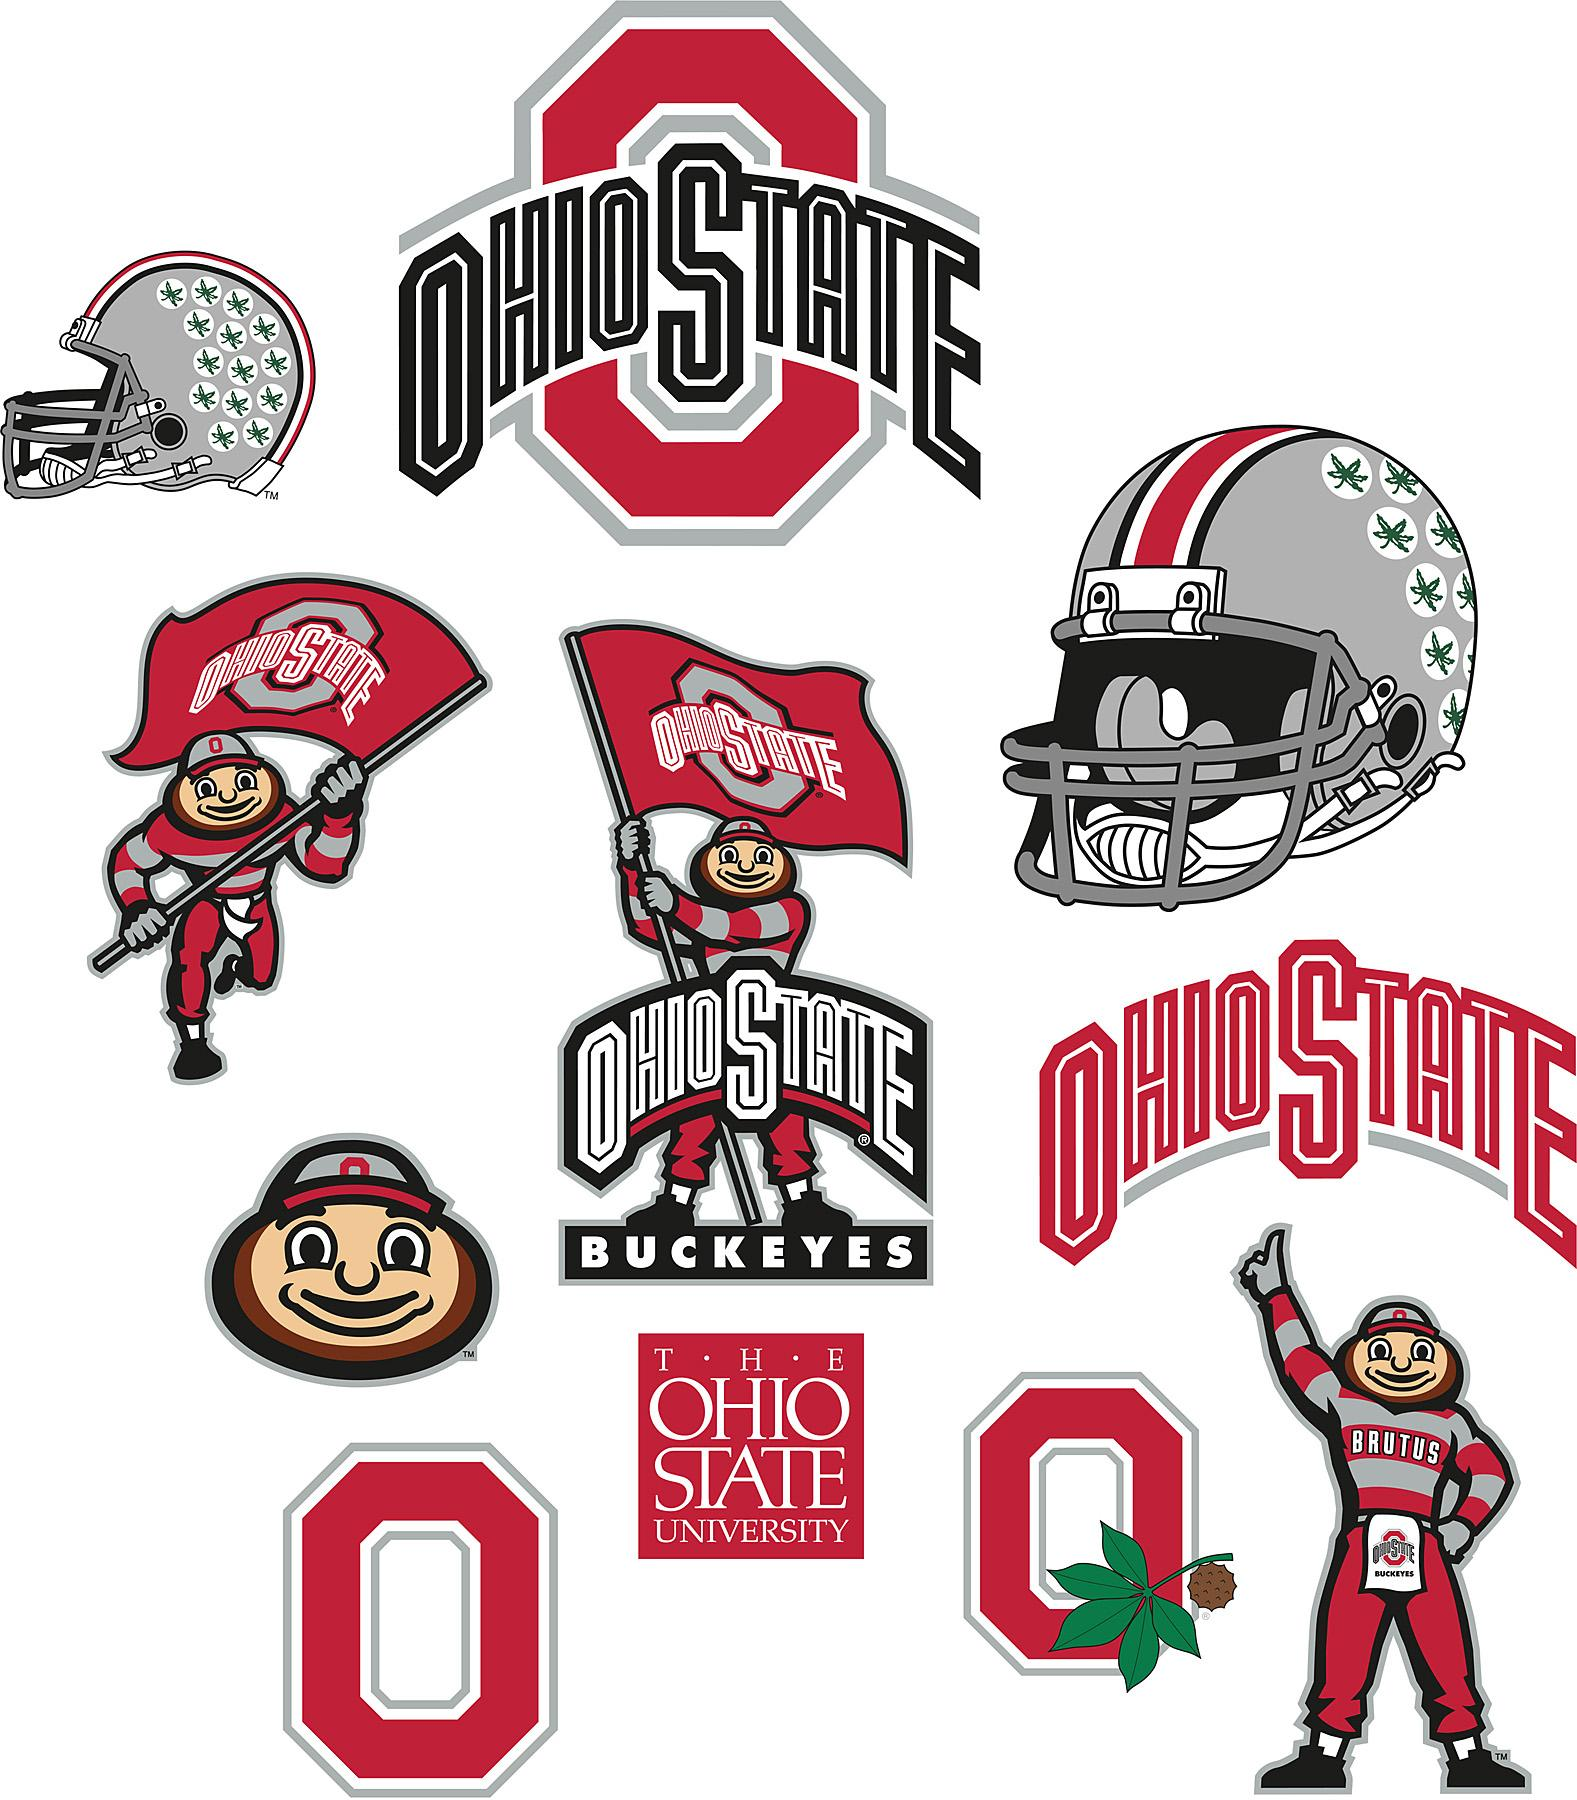 Ohio state buckeyes logo clip art svg Ohio state buckeyes logo clip art - ClipartFest svg